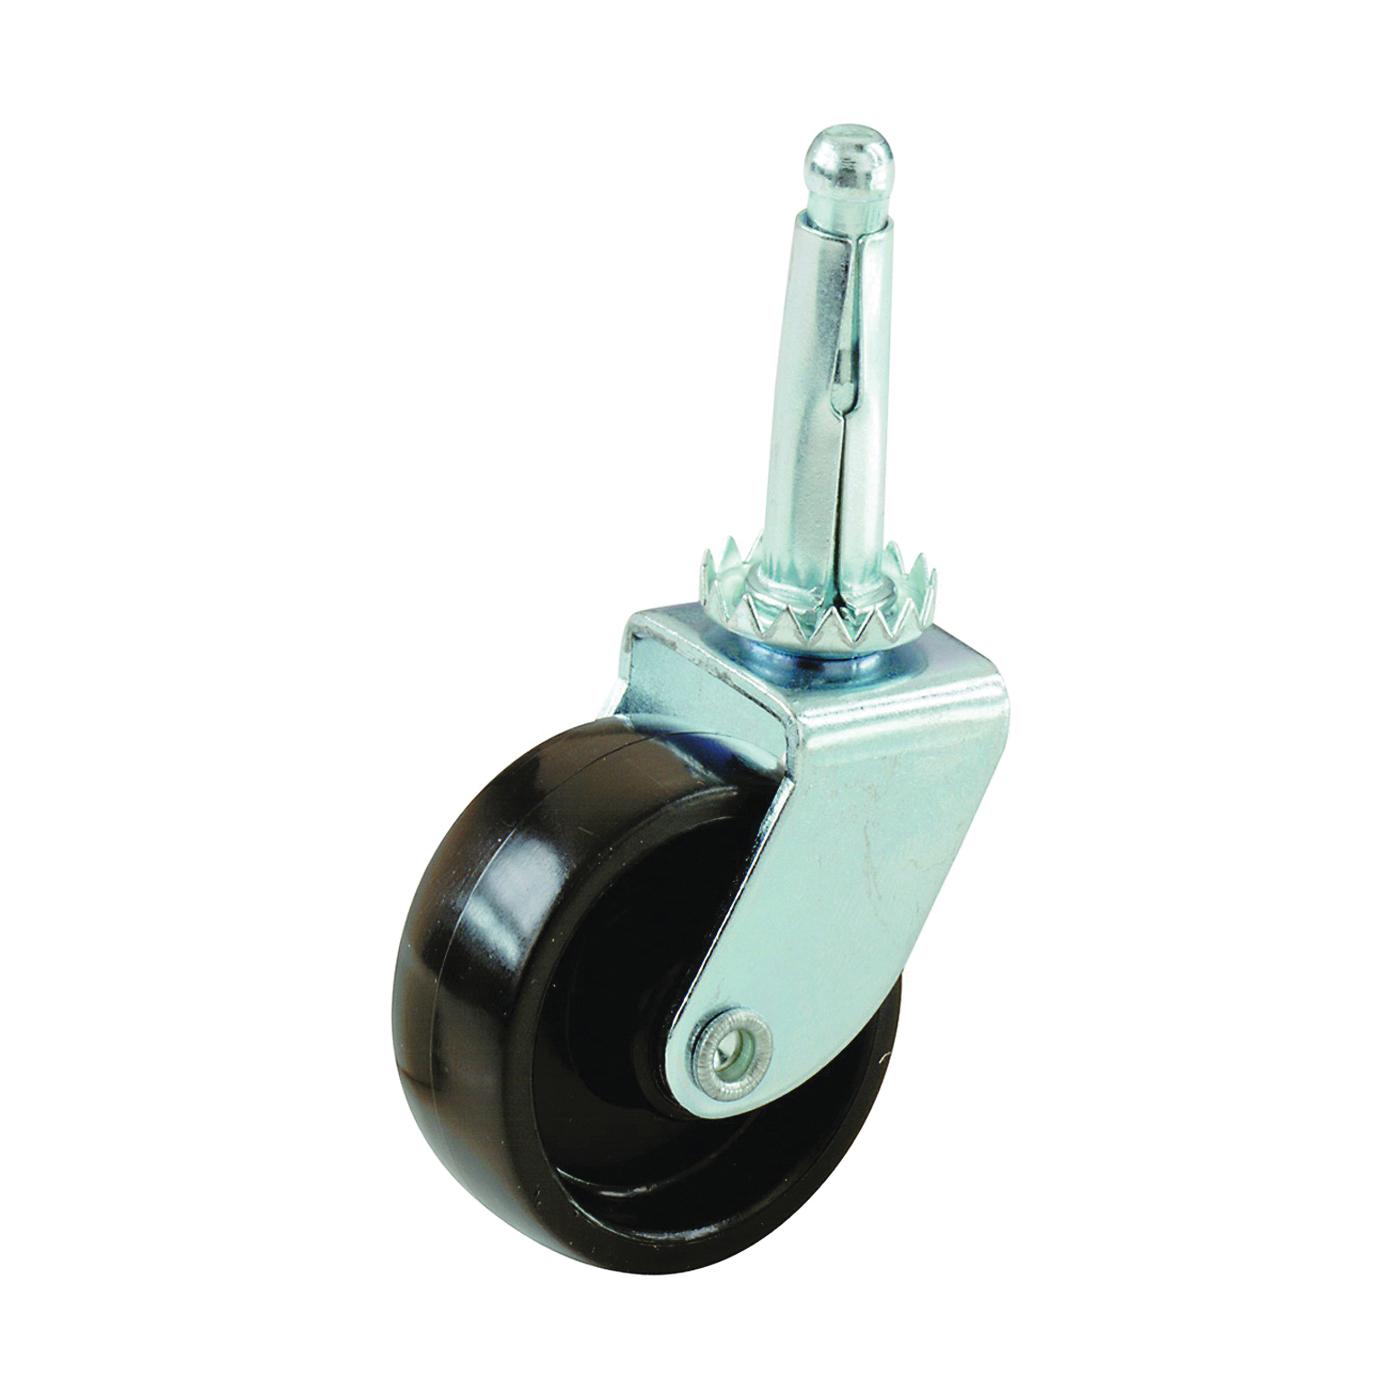 Picture of Shepherd Hardware 9559 Swivel Caster, 1-5/8 in Dia Wheel, Plastic Wheel, Black, 50 lb